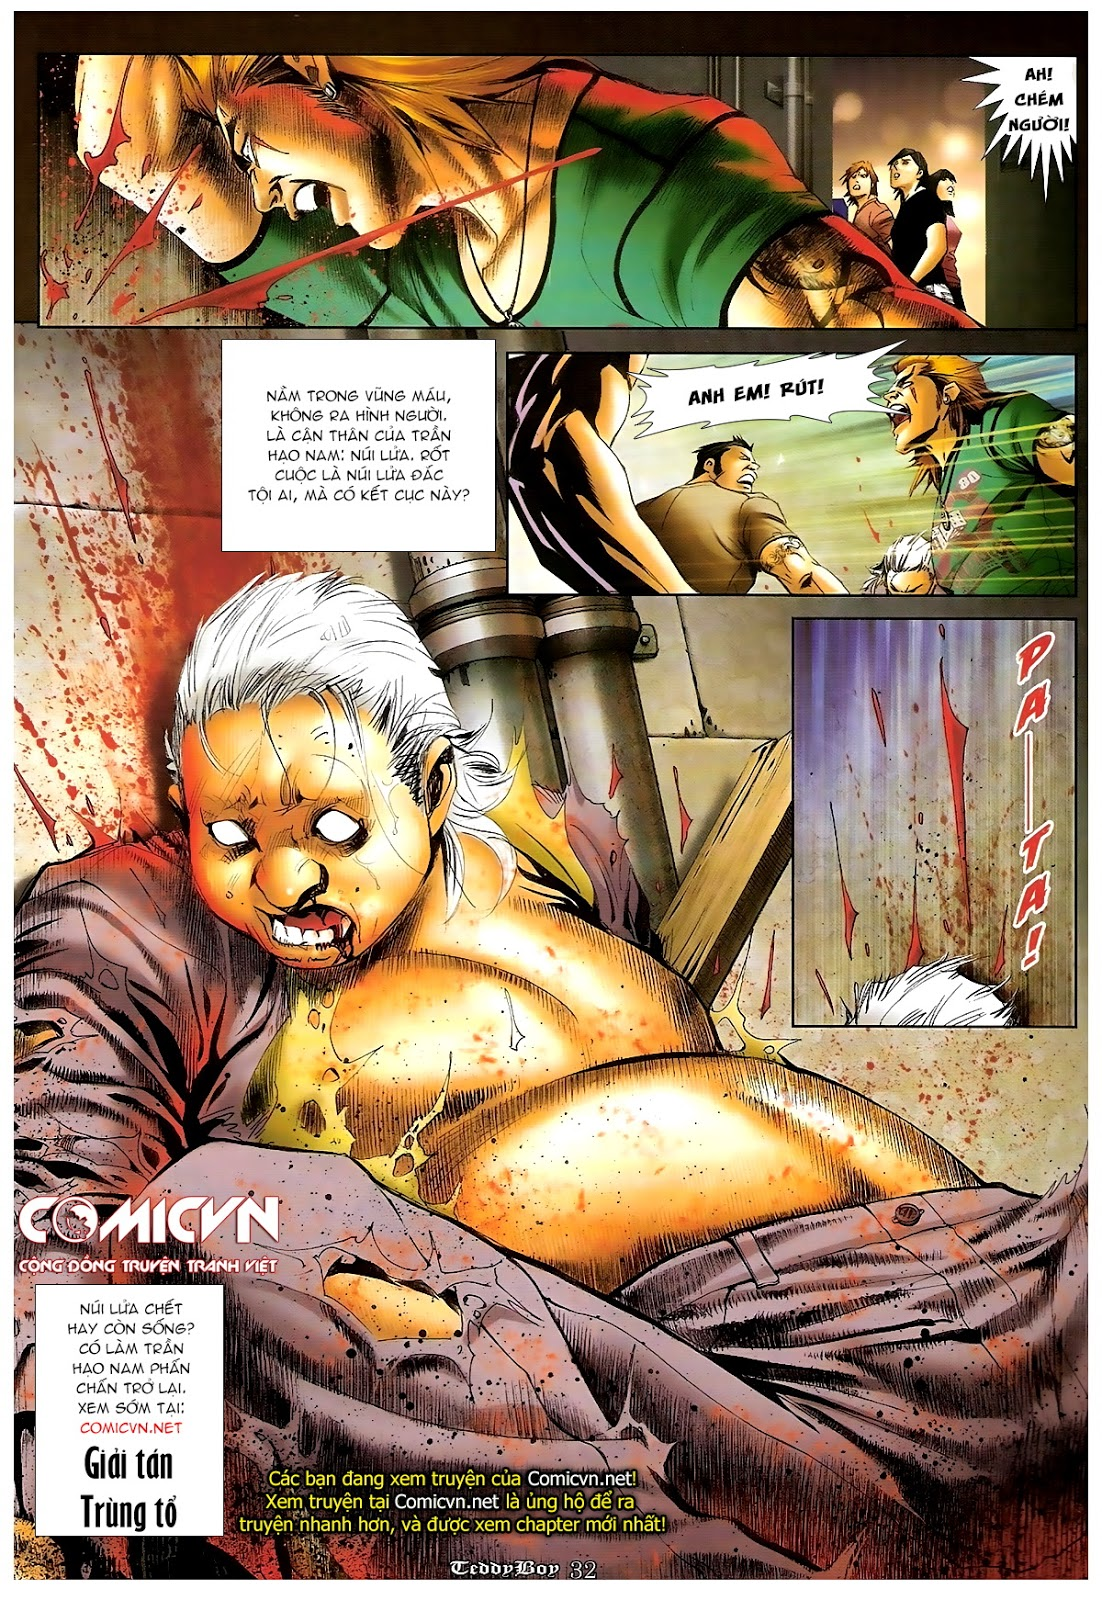 Người Trong Giang Hồ - Chapter 1209: Cai nghiện - Pic 29